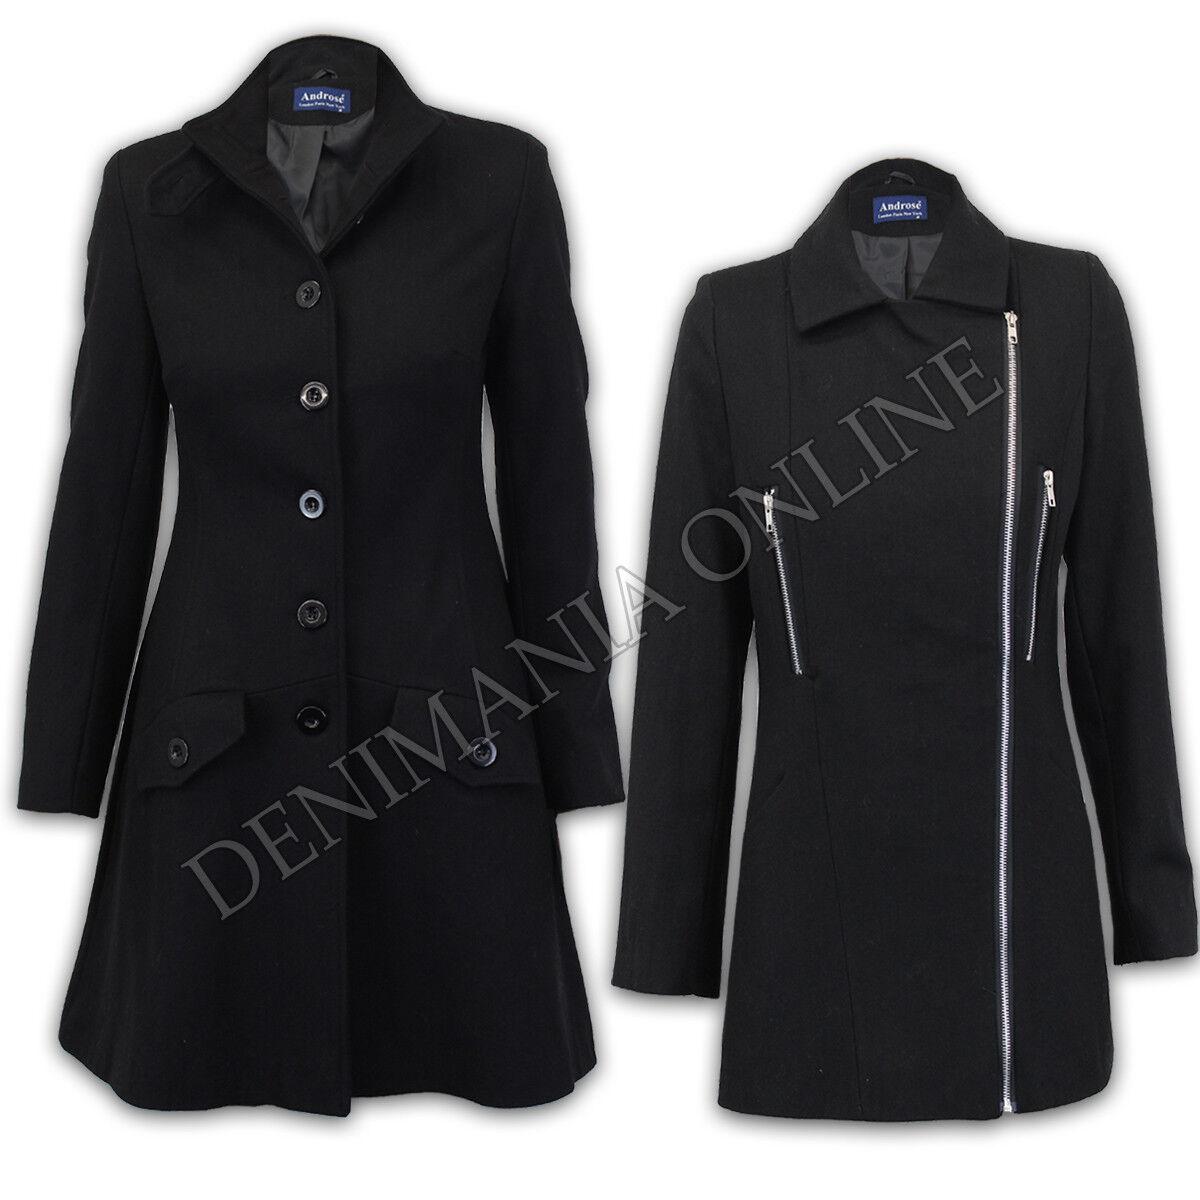 Damen Oberbekleidung Mode gefüttert Winter Wolle Mix Mantel Damen Graben lange Jacke